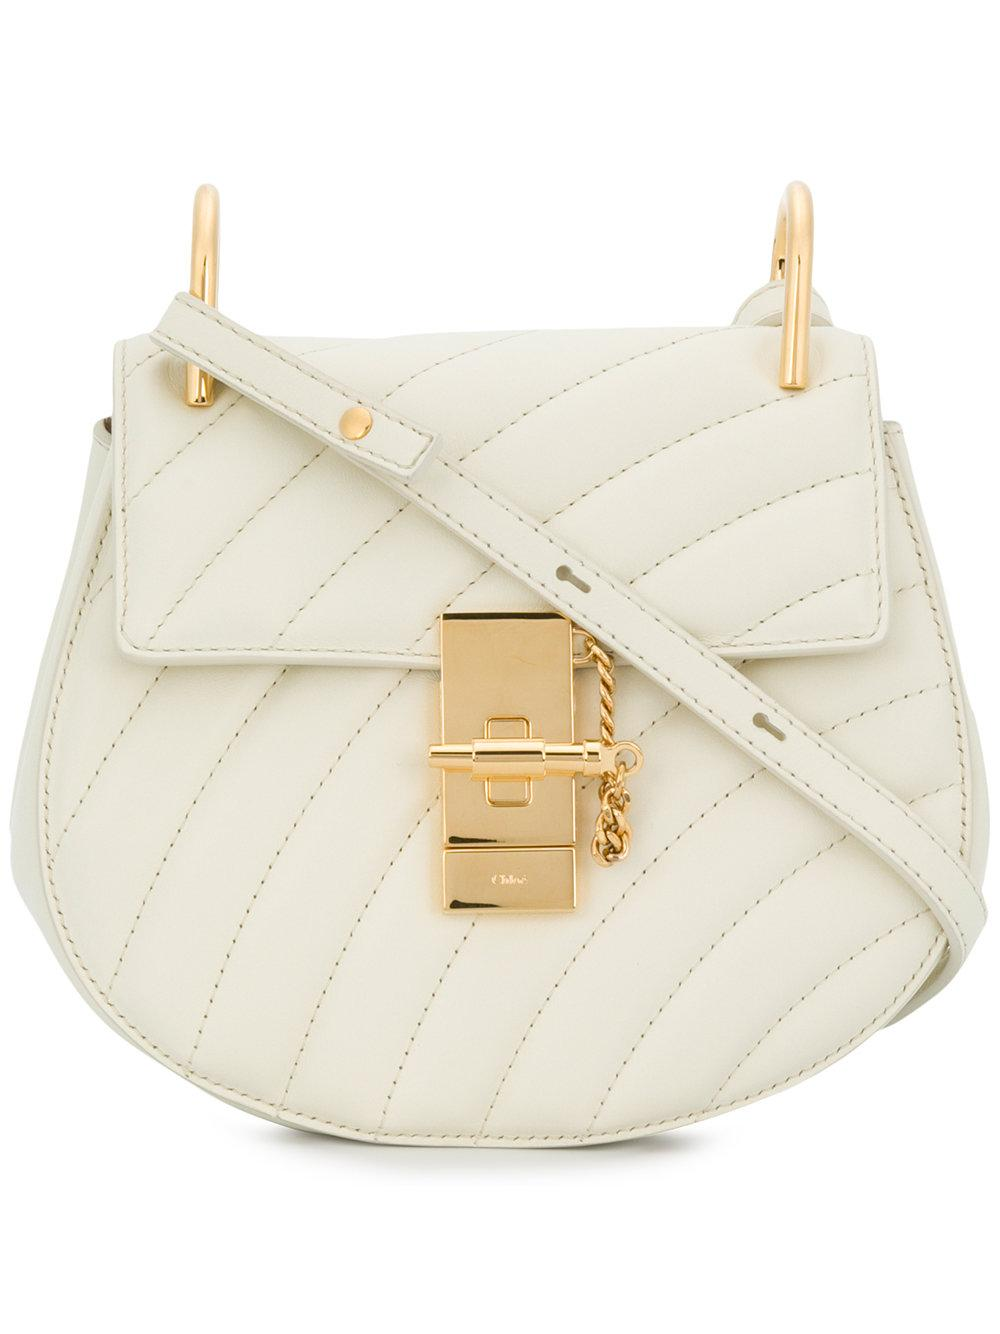 d1438f4f1db CHLOÉ. Chloé Drew Bijou Mini Shoulder Bag ...